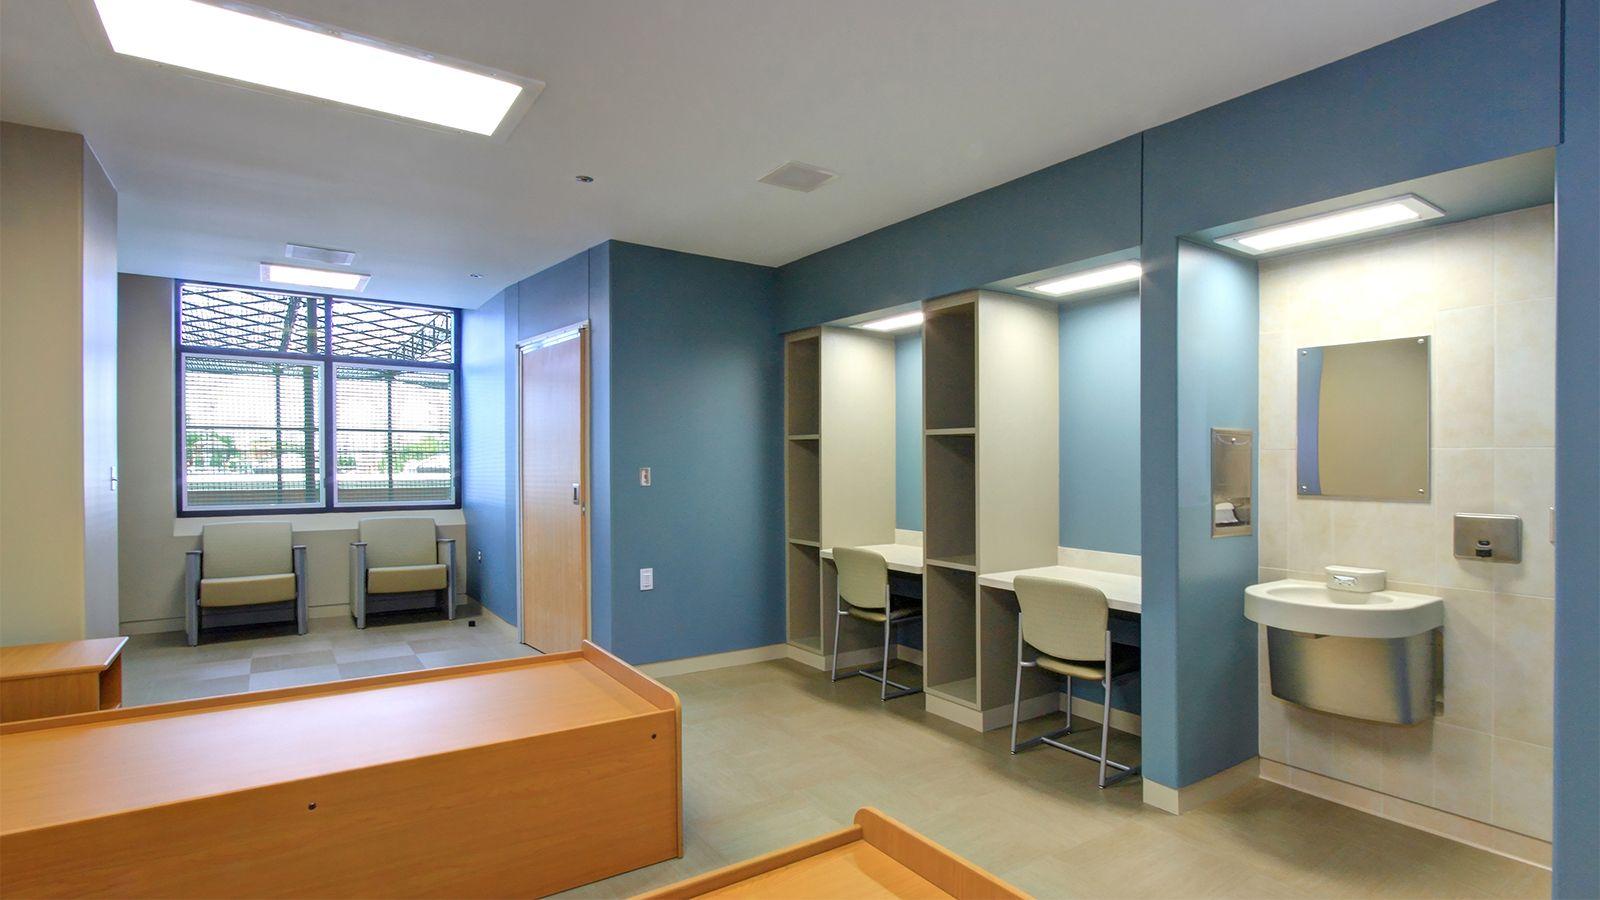 Image result for behavioral health design health mirror